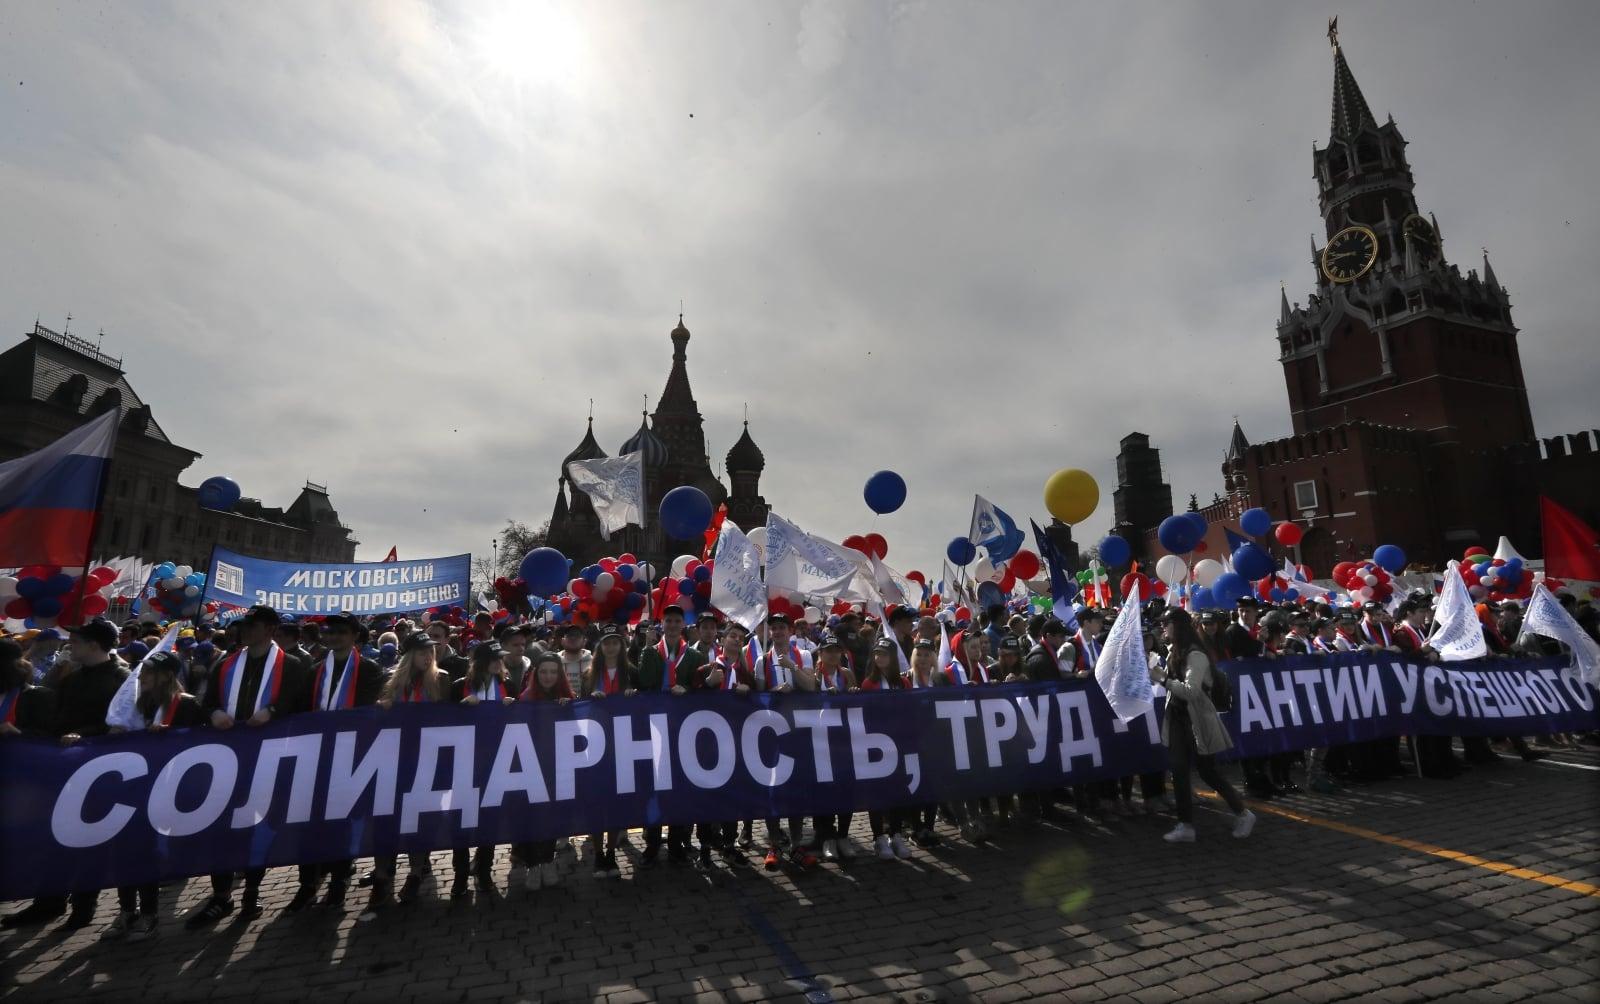 Rosja EPA/YURI KOCHETKOV